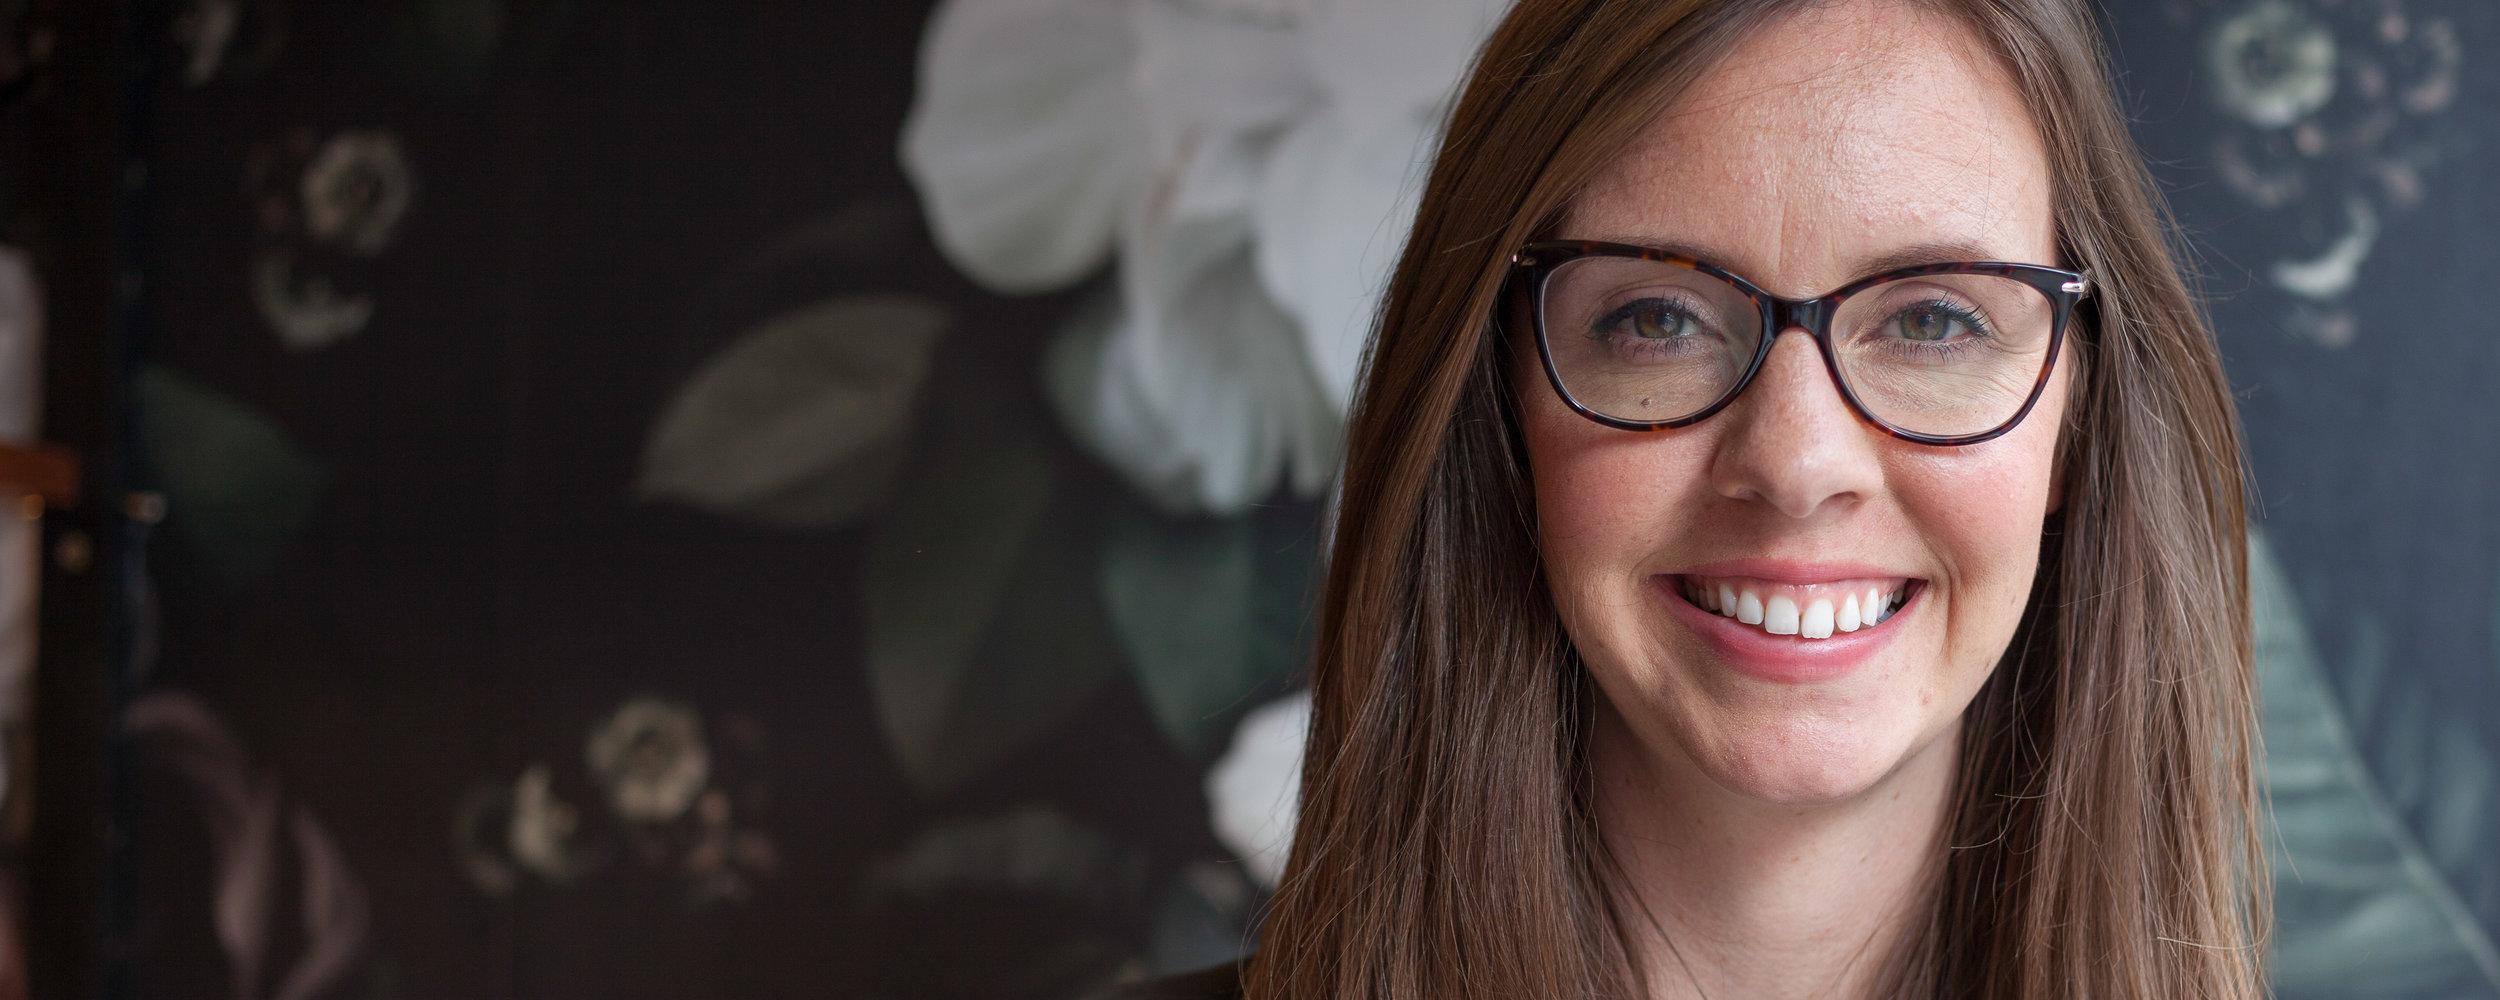 Gazelli Habit Coach Dr Heather McKee